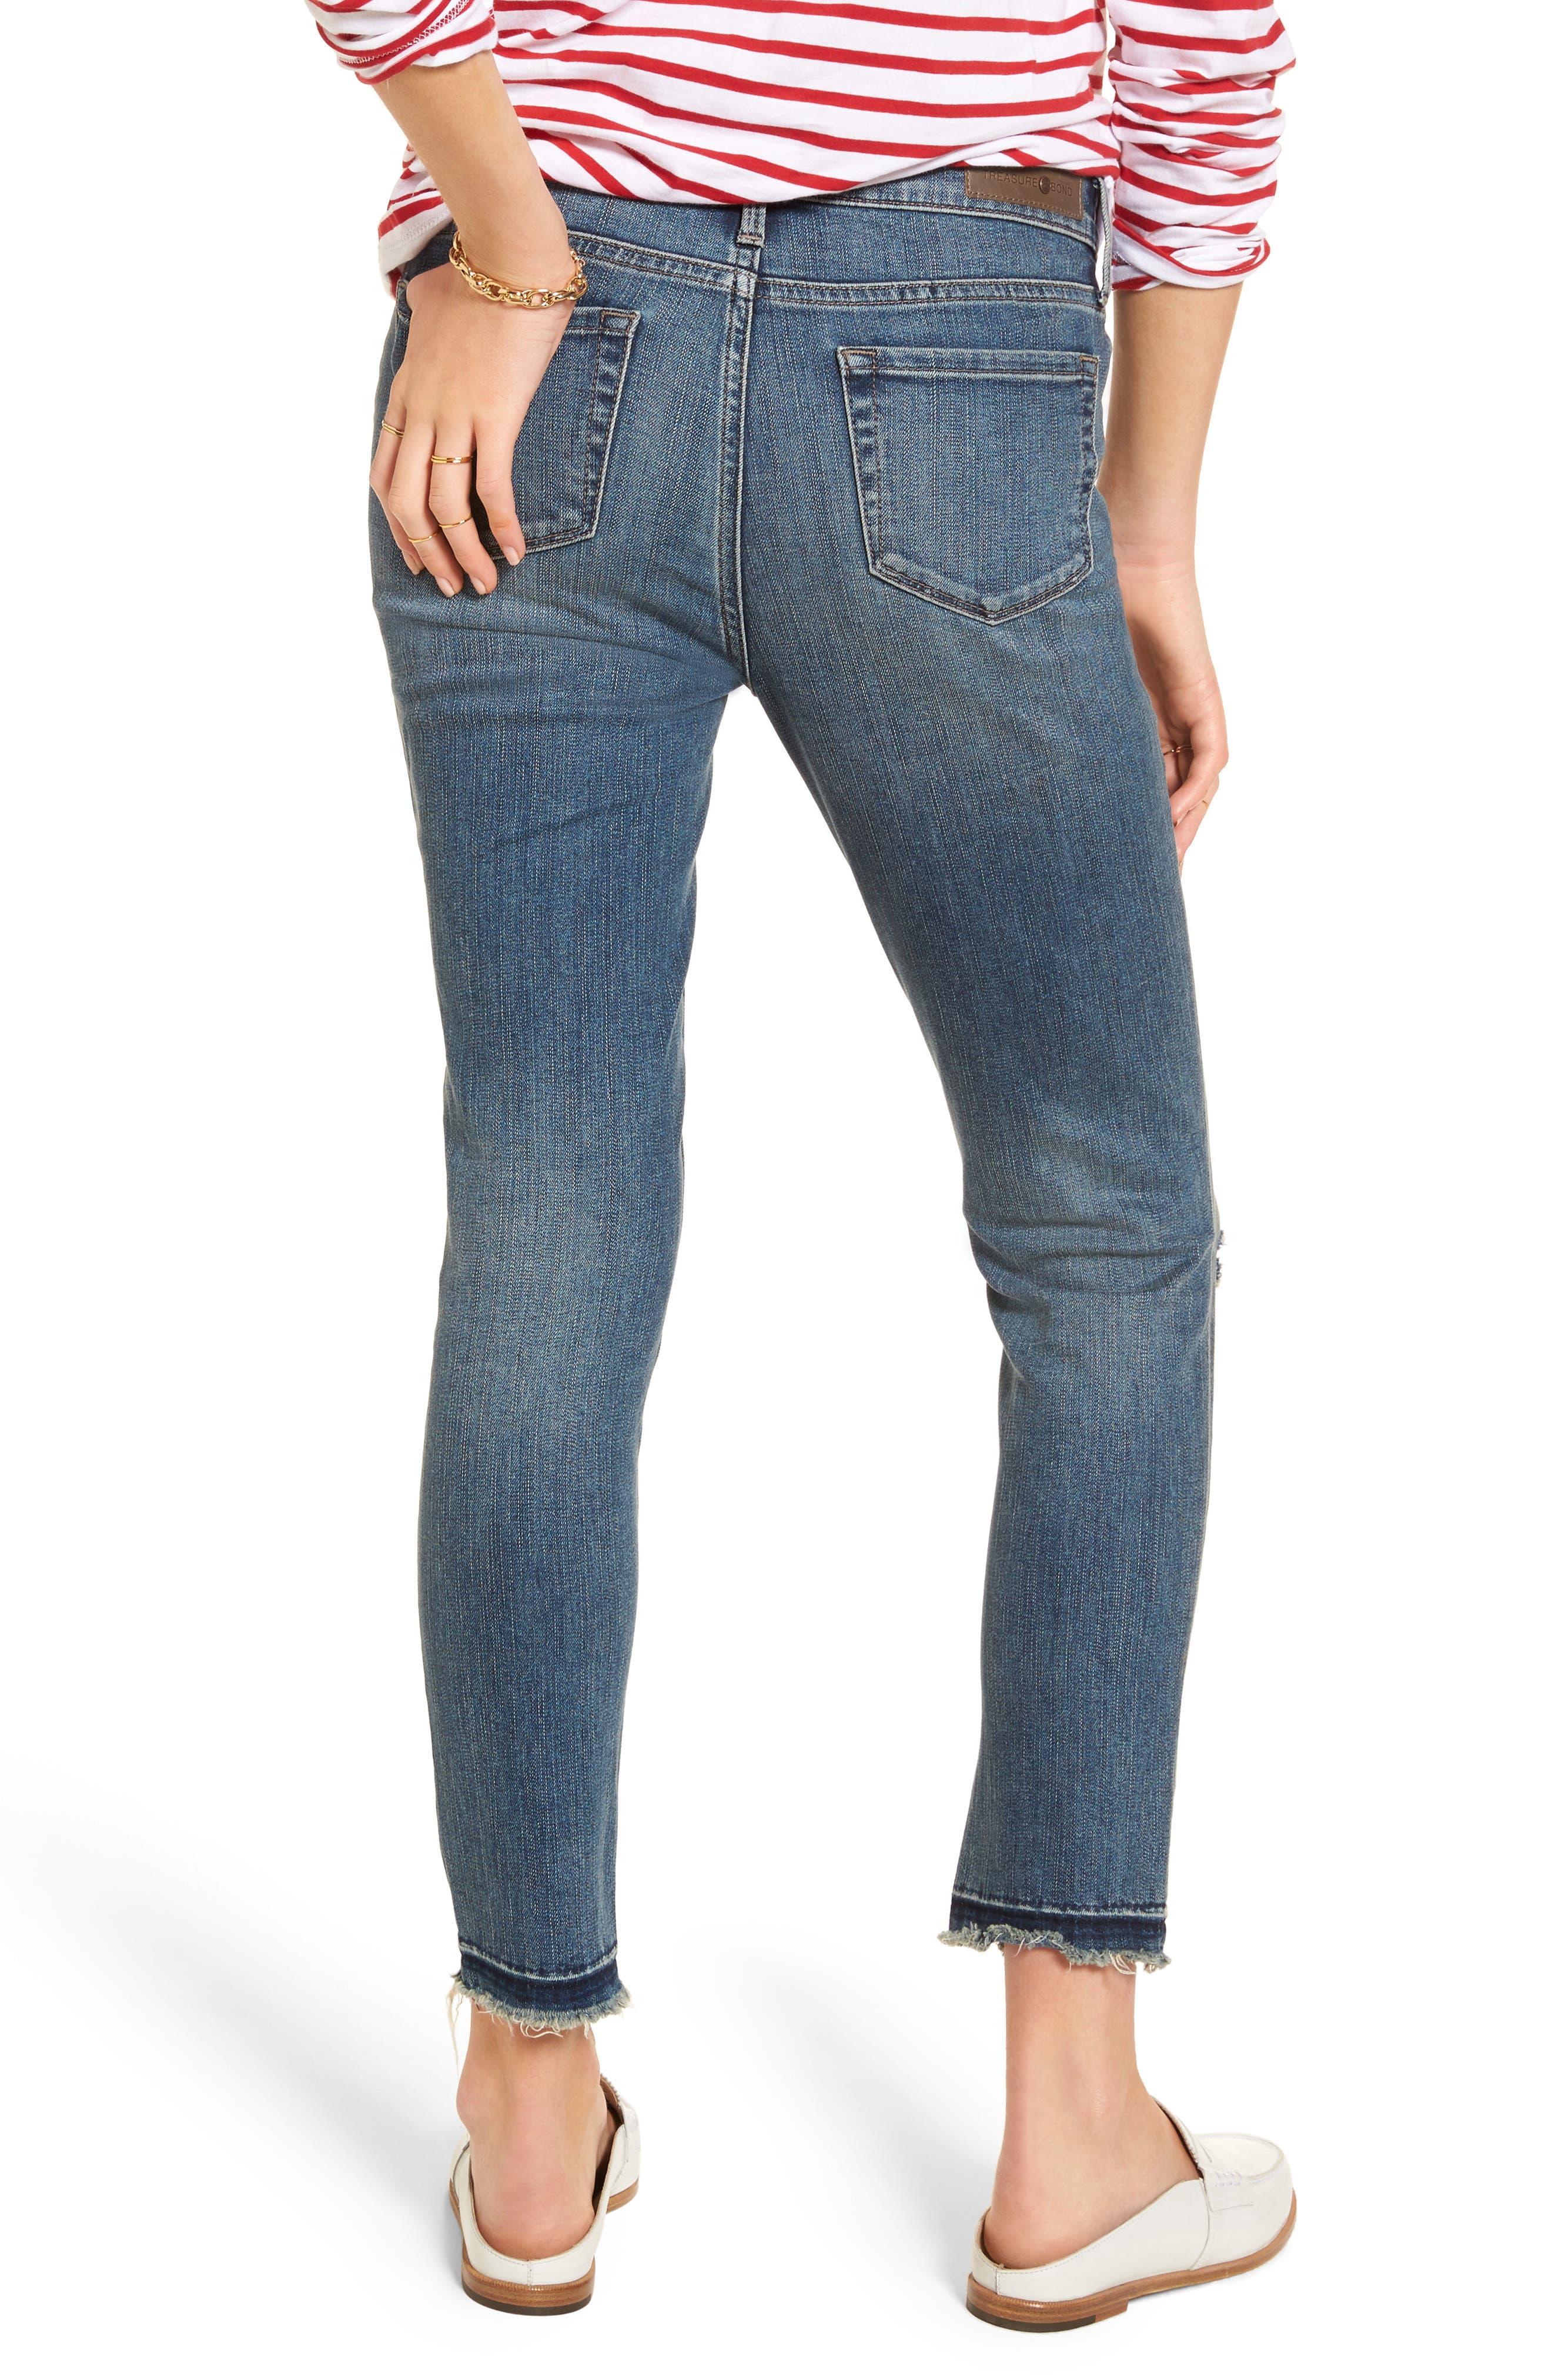 Alternate Image 2  - Treasure & Bond Ankle Skinny Jeans (Rain Dusk Destroy)